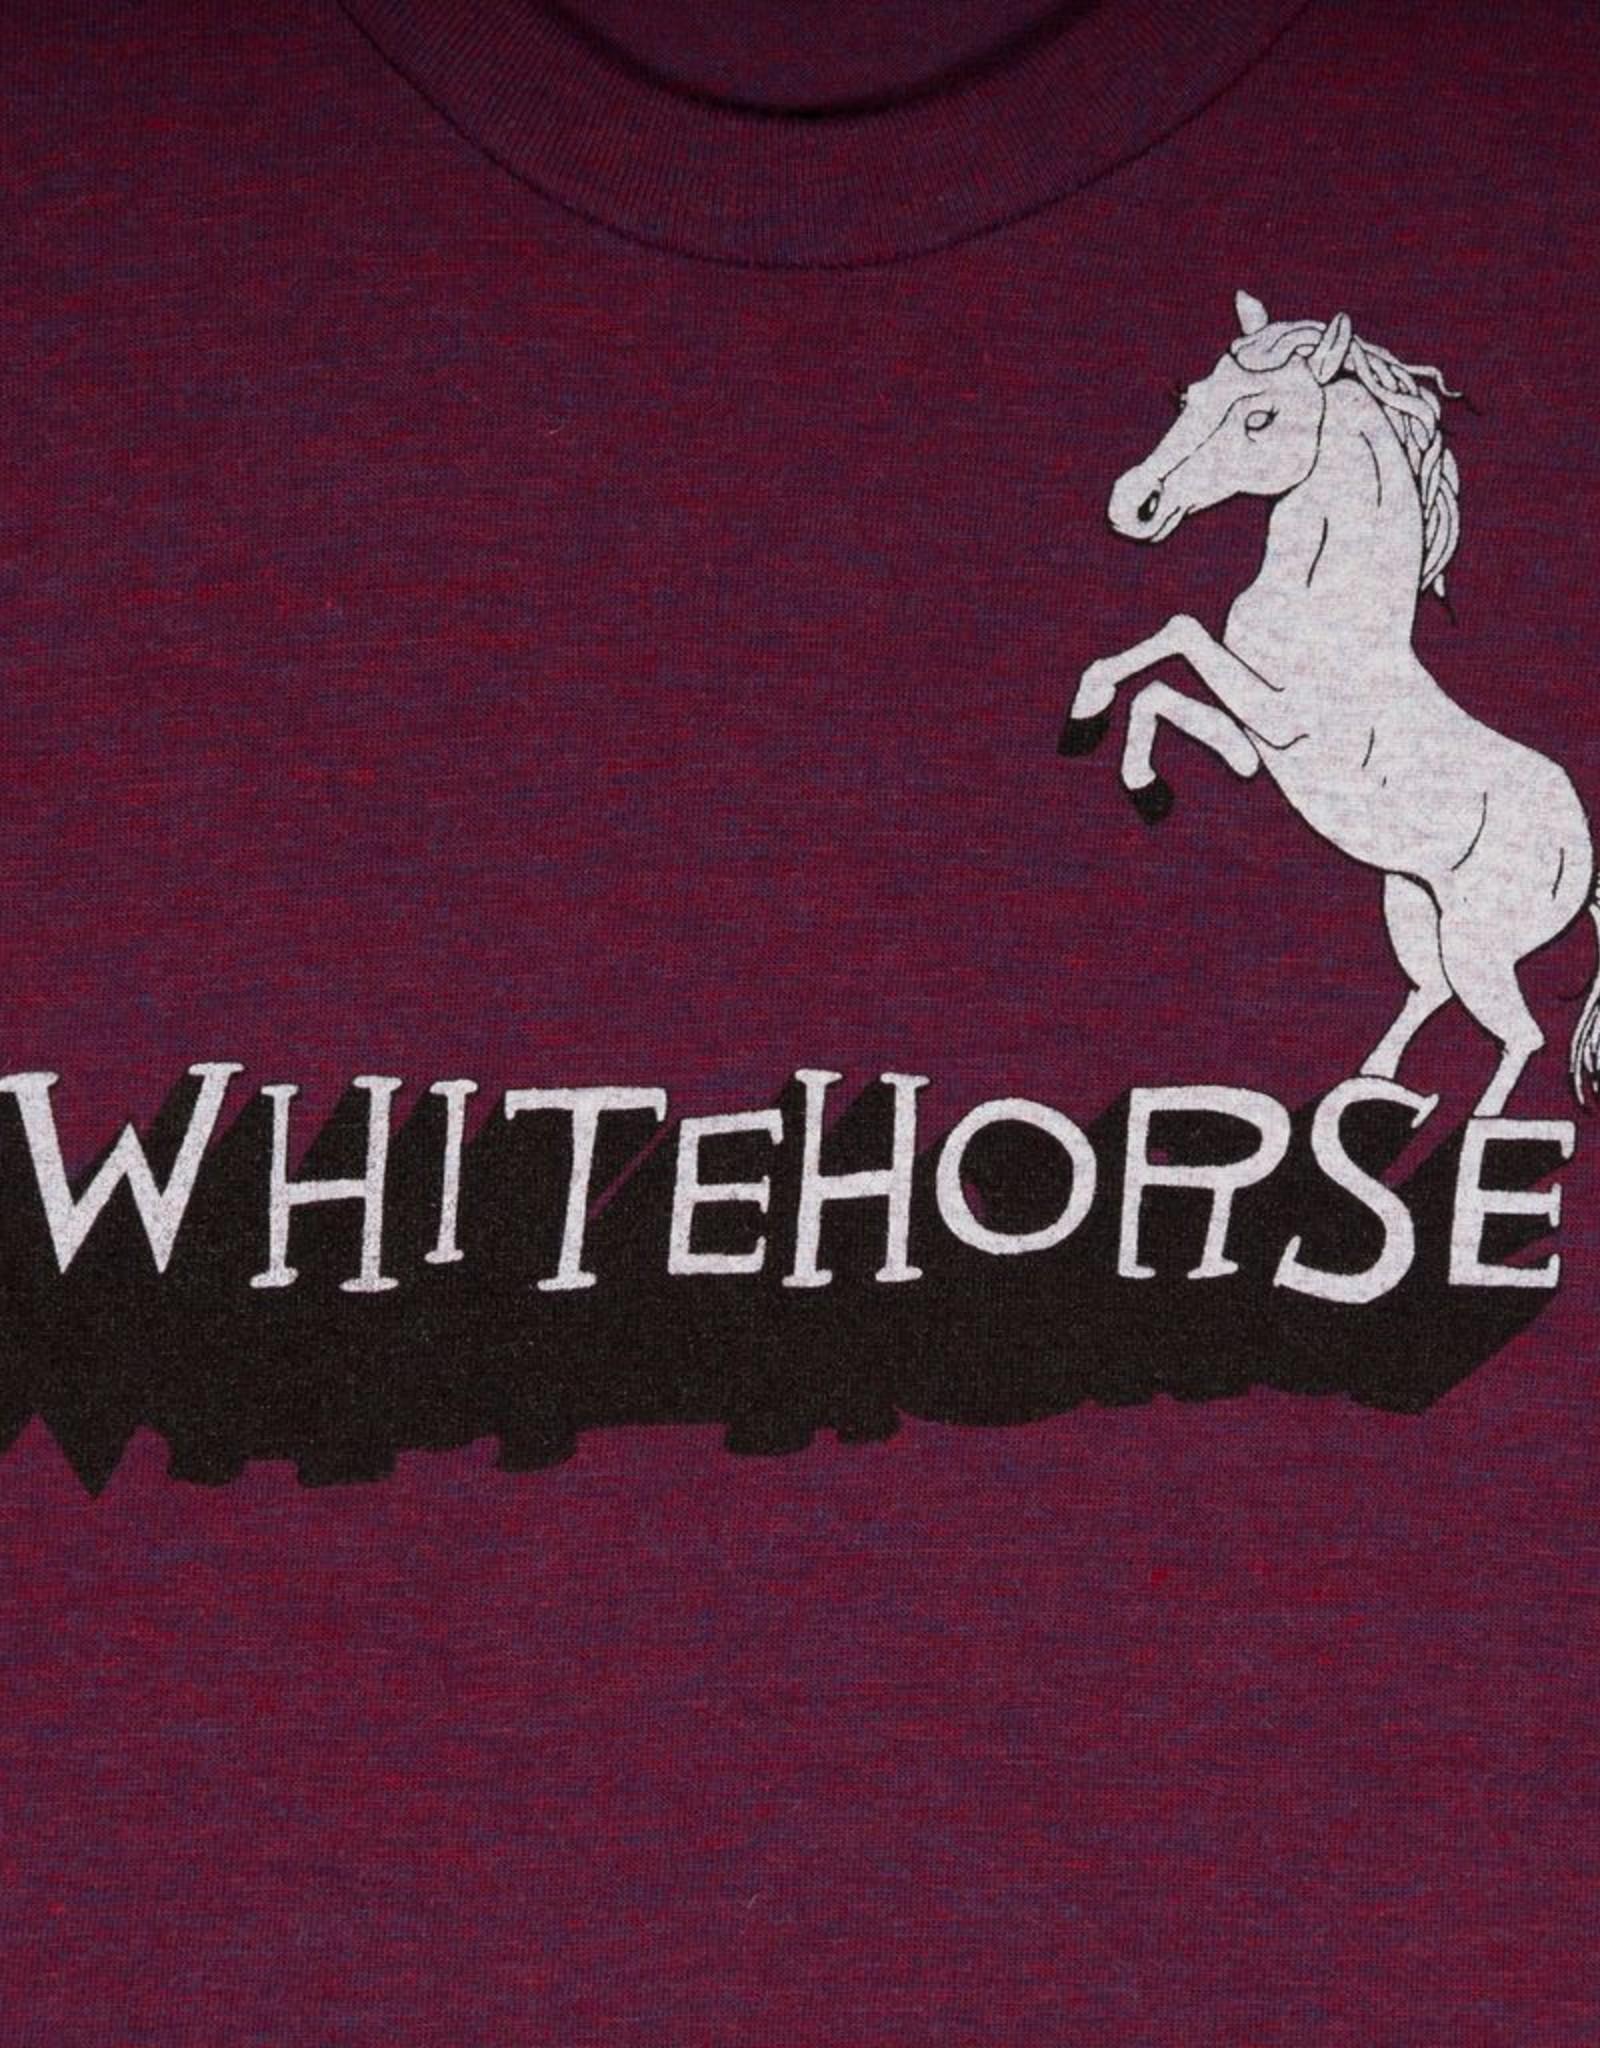 Women's Whitehorse T-shirt